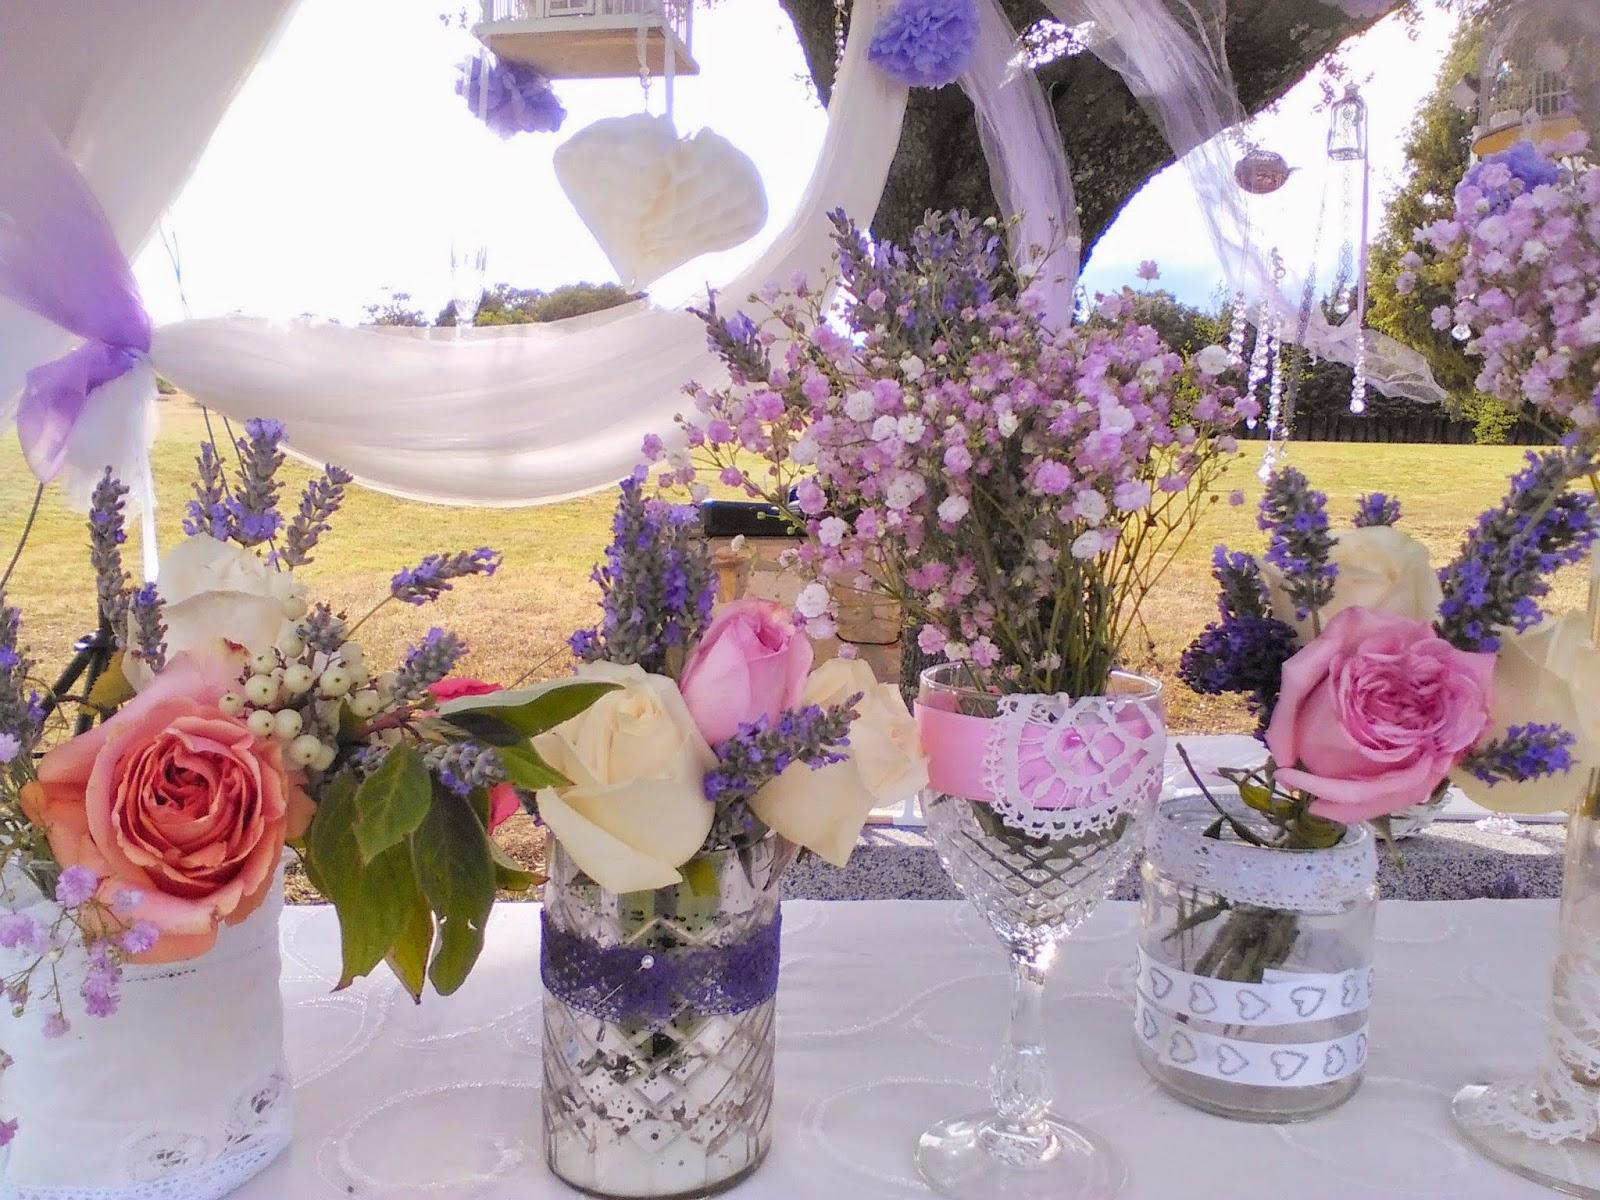 Adornos para bodas civiles beautiful resultado de imagen para bodas al aire libre with adornos - Decoracion ceremonia civil ...